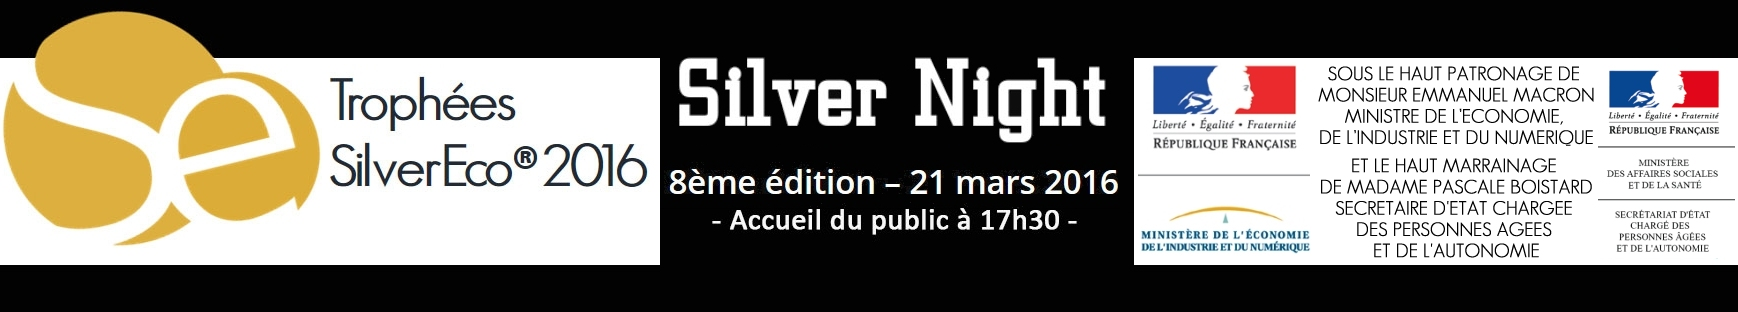 SilverNight 2016